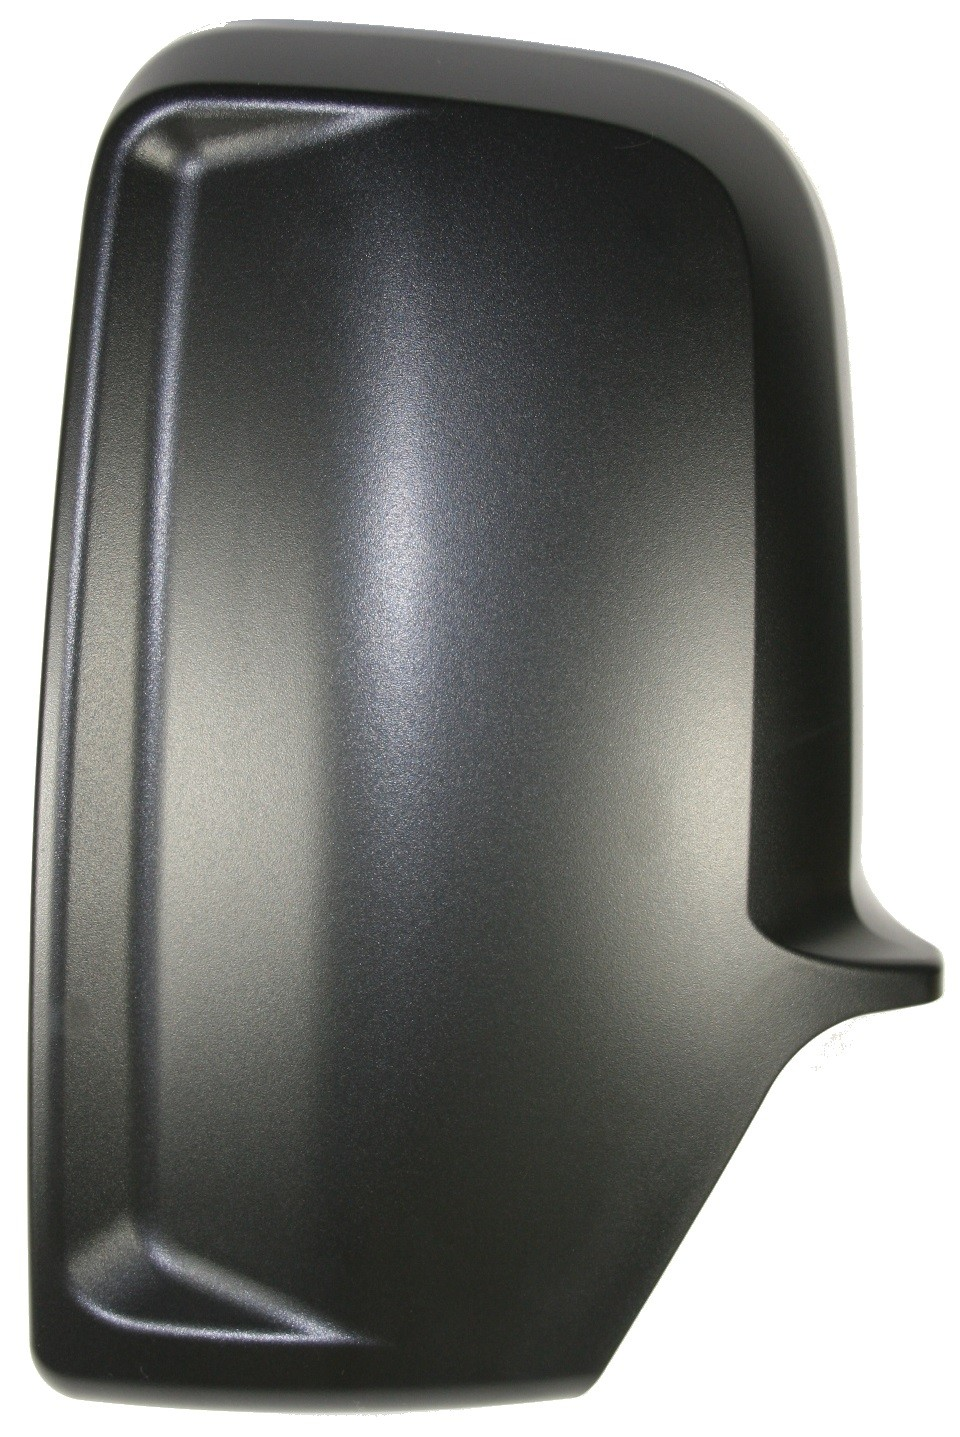 Carcasa espejo retrovisor derecho mercedes sprinter 2006 for Espejo retrovisor derecho